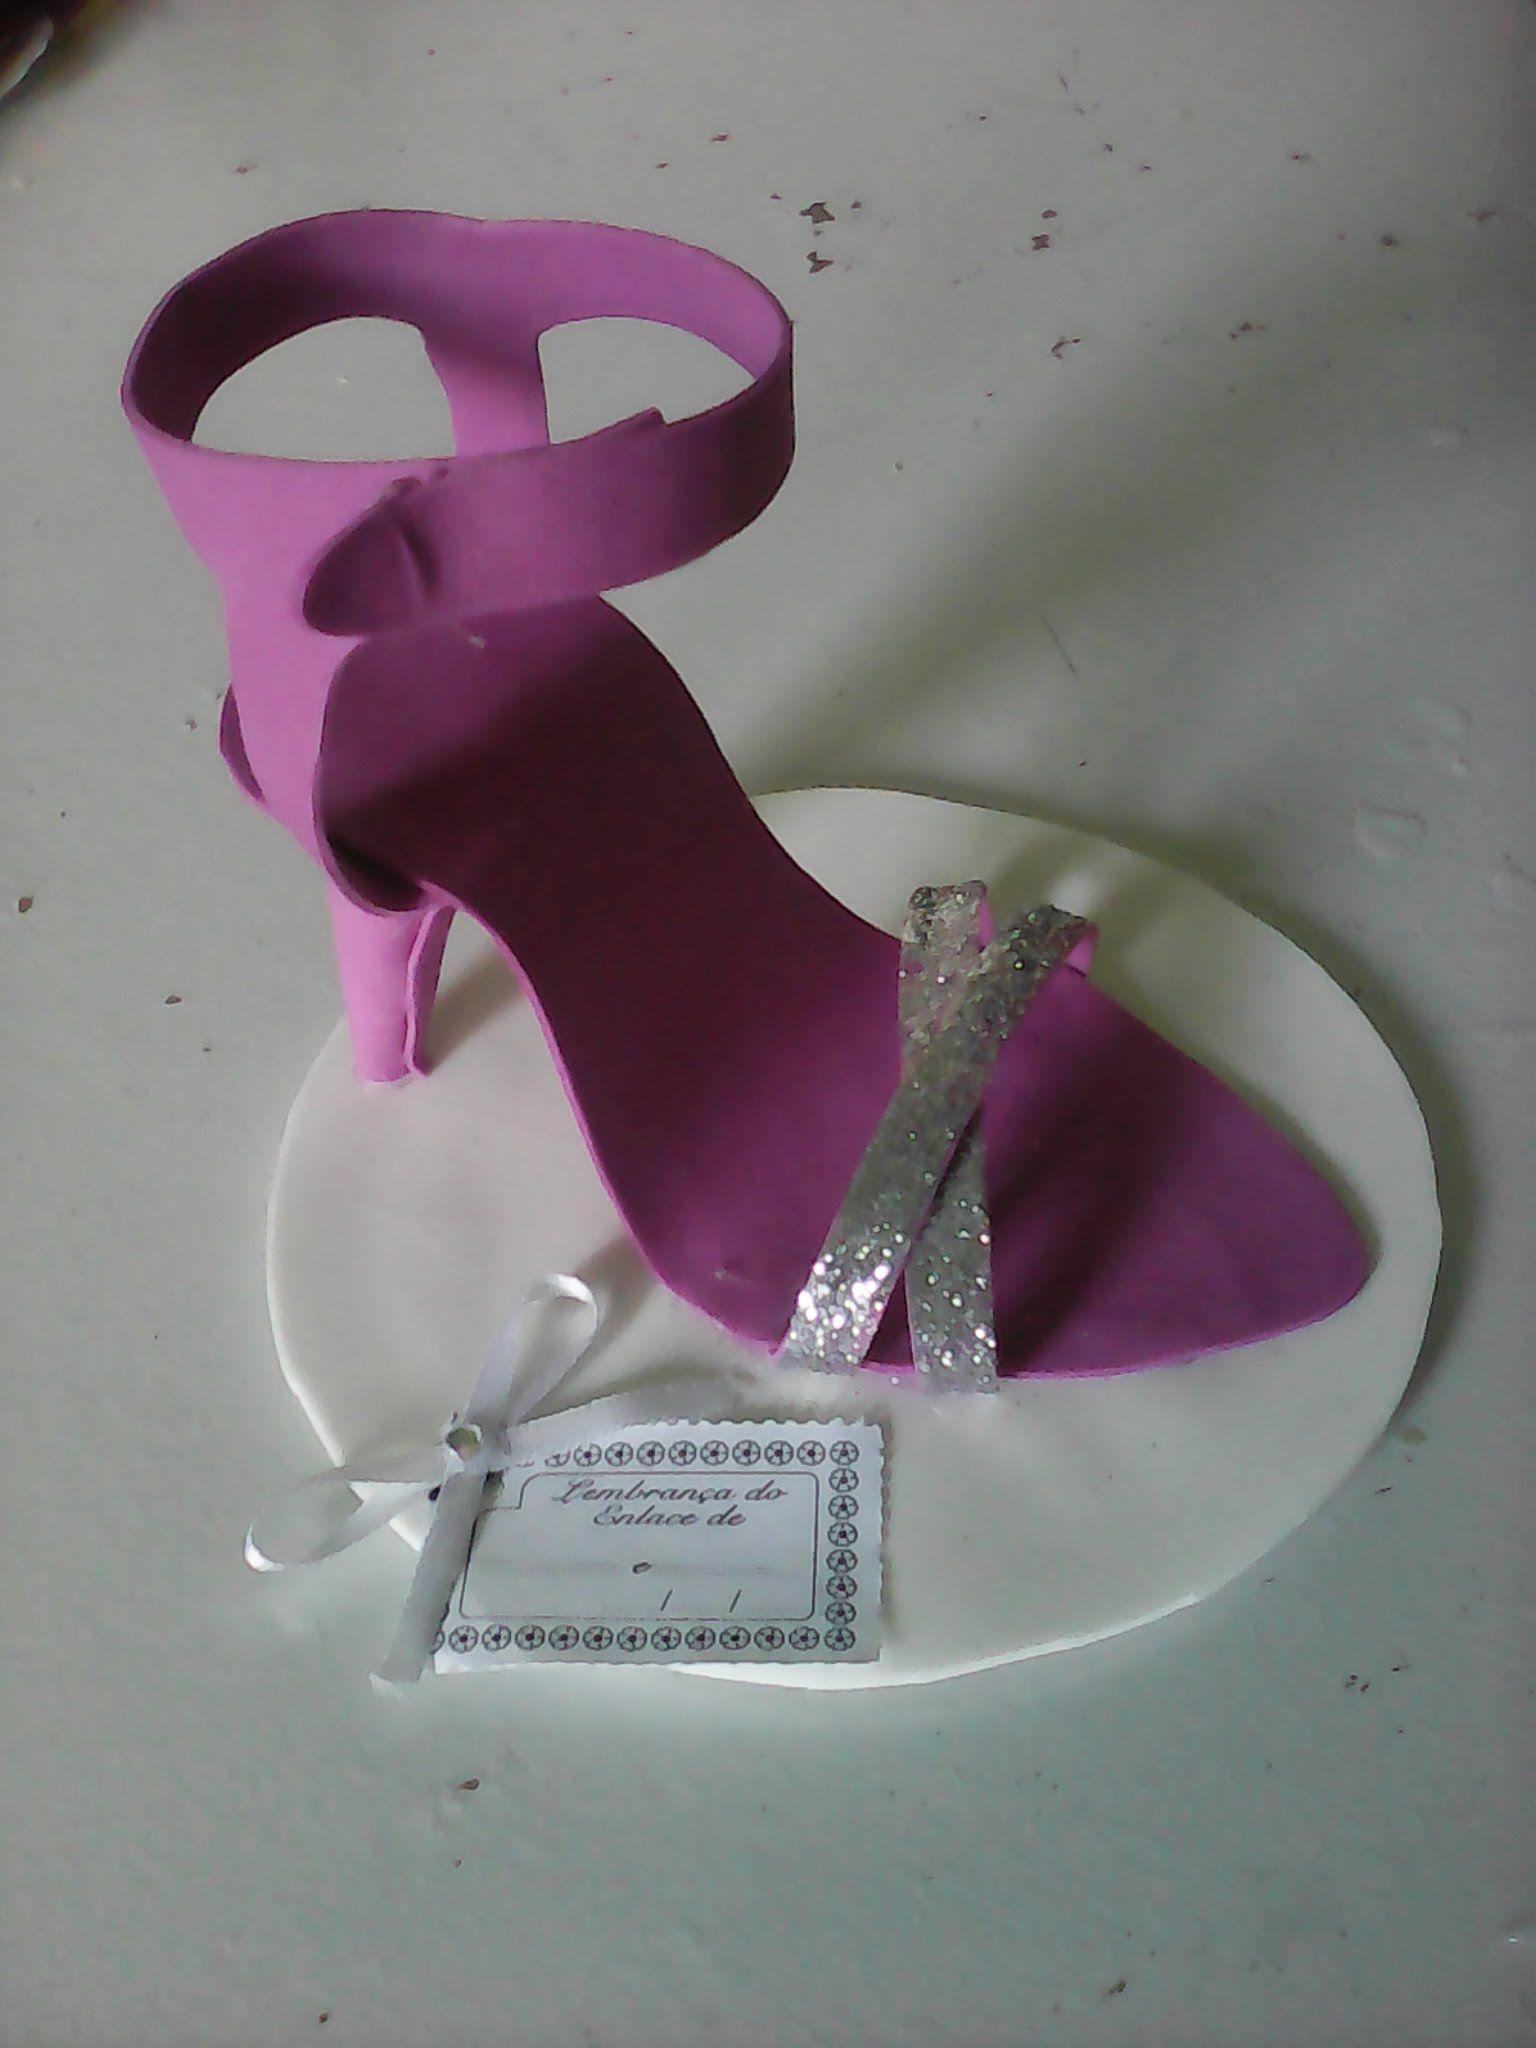 bd9ac2f05 Zapatos De Foami, Zapatos De Chocolate, Manualidades Zapatos, Hacer  Zapatos, Manualidades Con